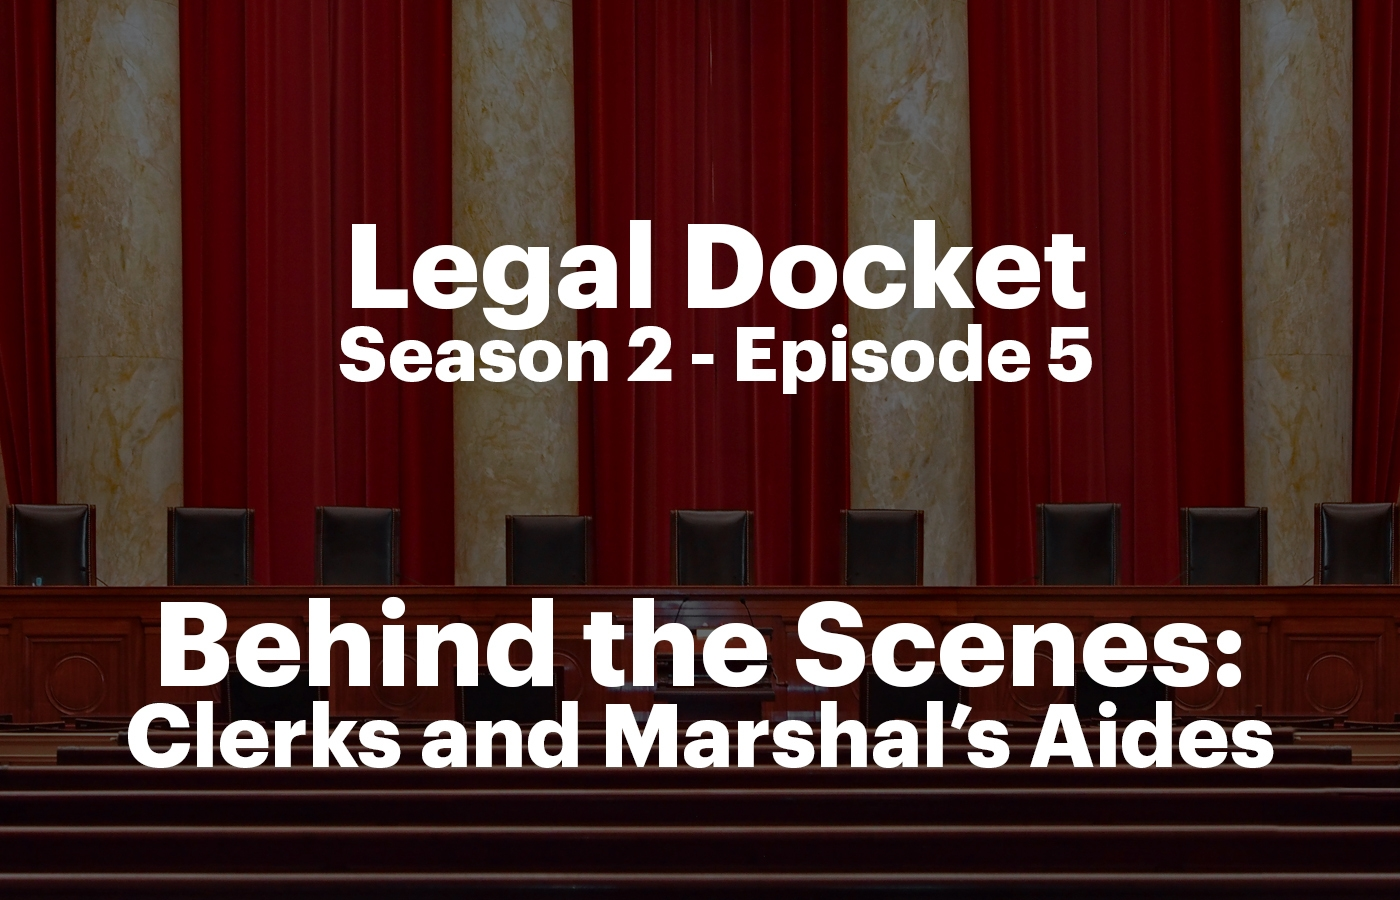 Legal Docket S2 E5 copy